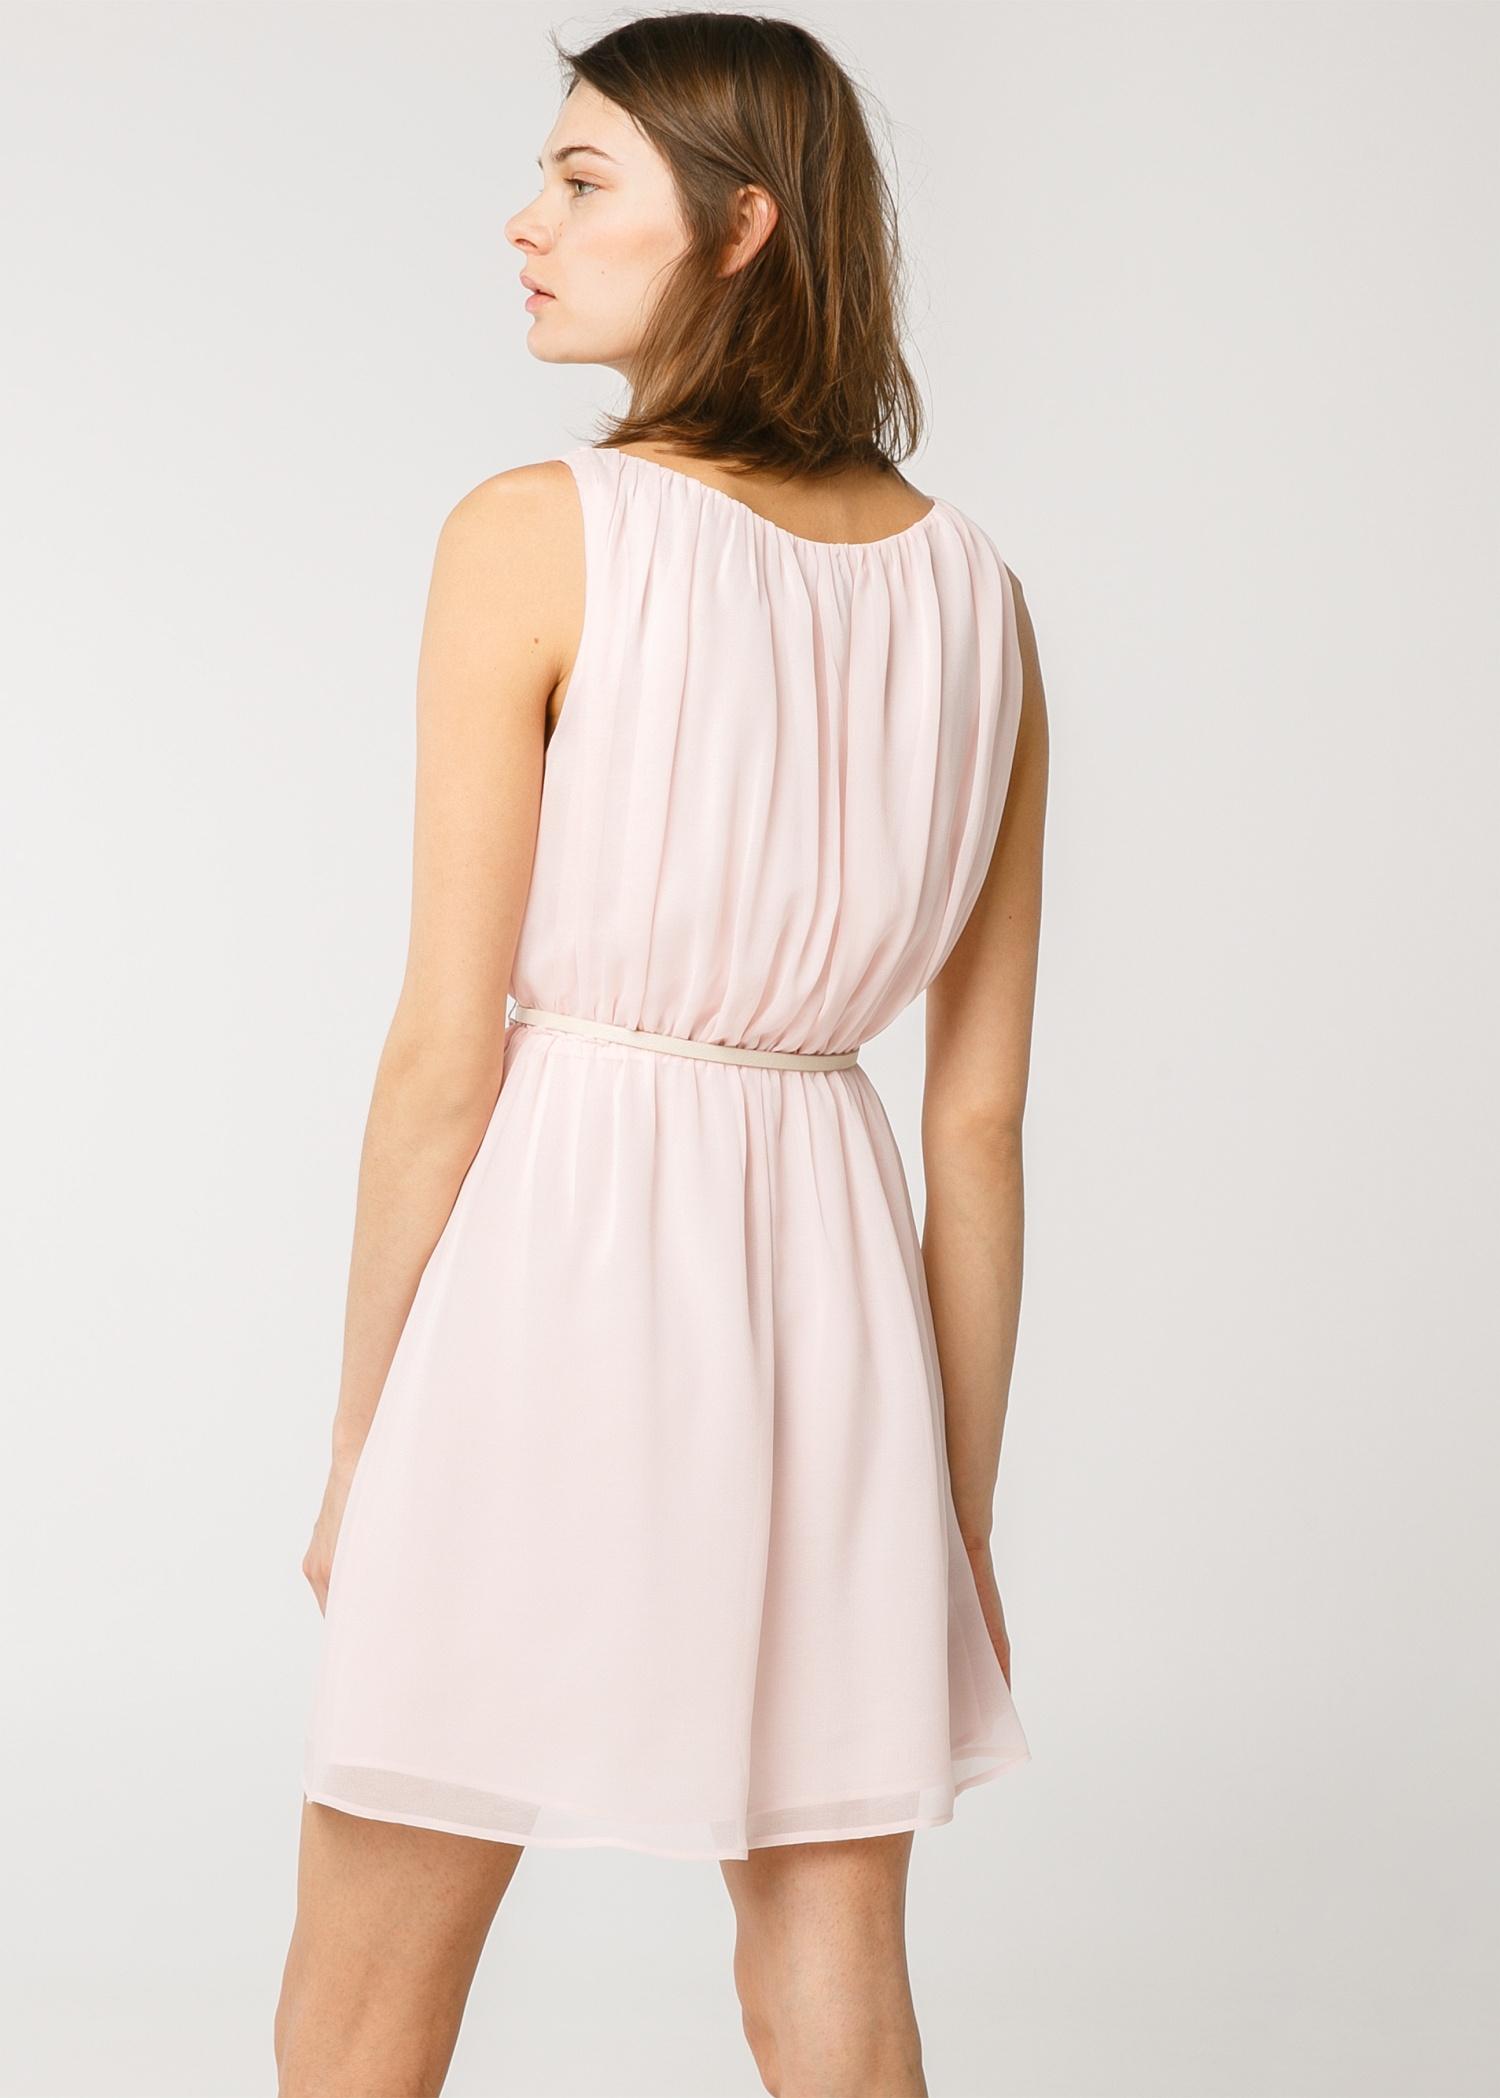 Lyst - Mango Pleated Flowy Dress in Pink